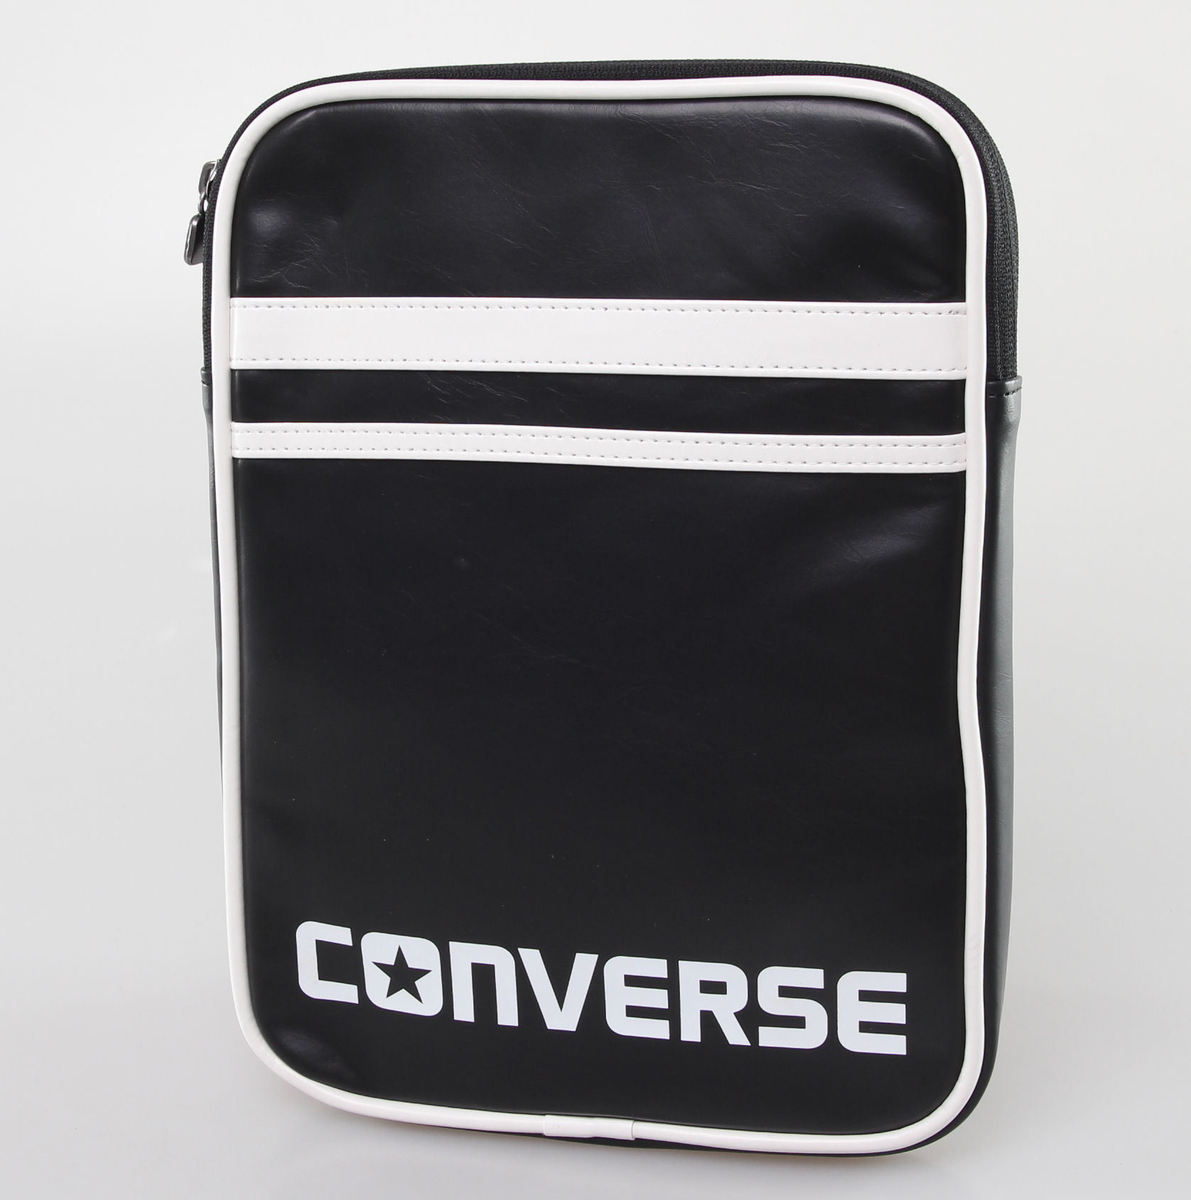 pouzdro CONVERSE - Tablet Sport - Blk/Wht - 410501/002